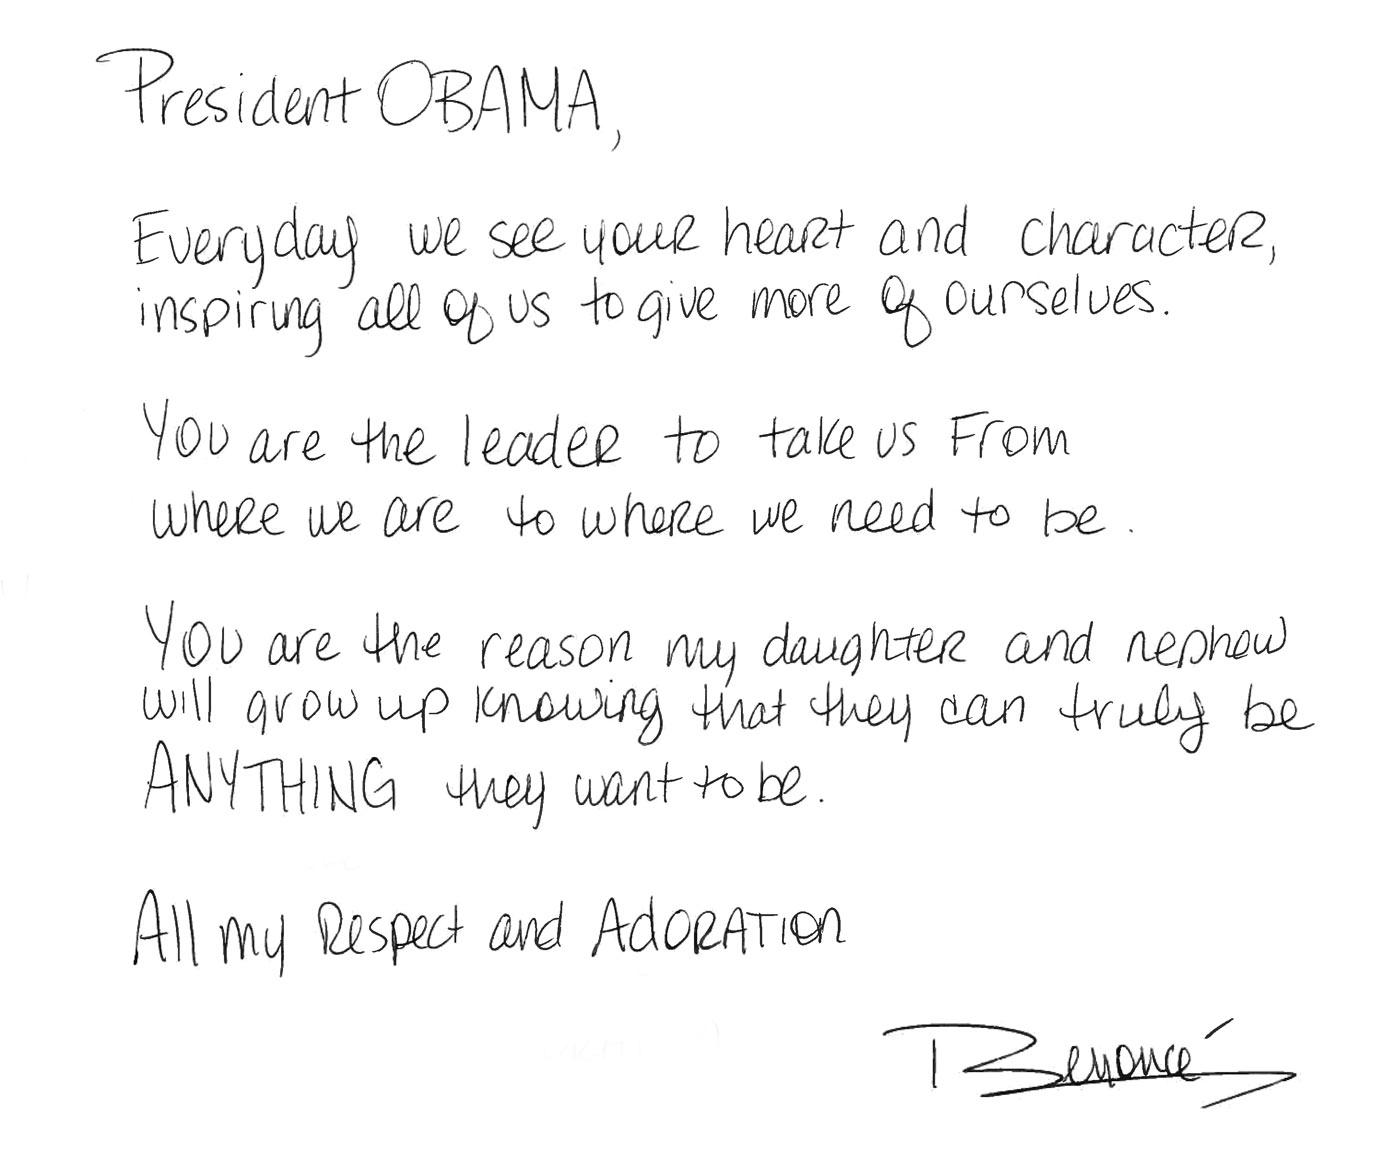 http://2.bp.blogspot.com/-StOG9yNTWLA/UJlEVxMzz9I/AAAAAAAAH2M/vSNknE2lr-Y/s1600/Obama+Beyonce+Letter++The+Lavish+World.jpeg